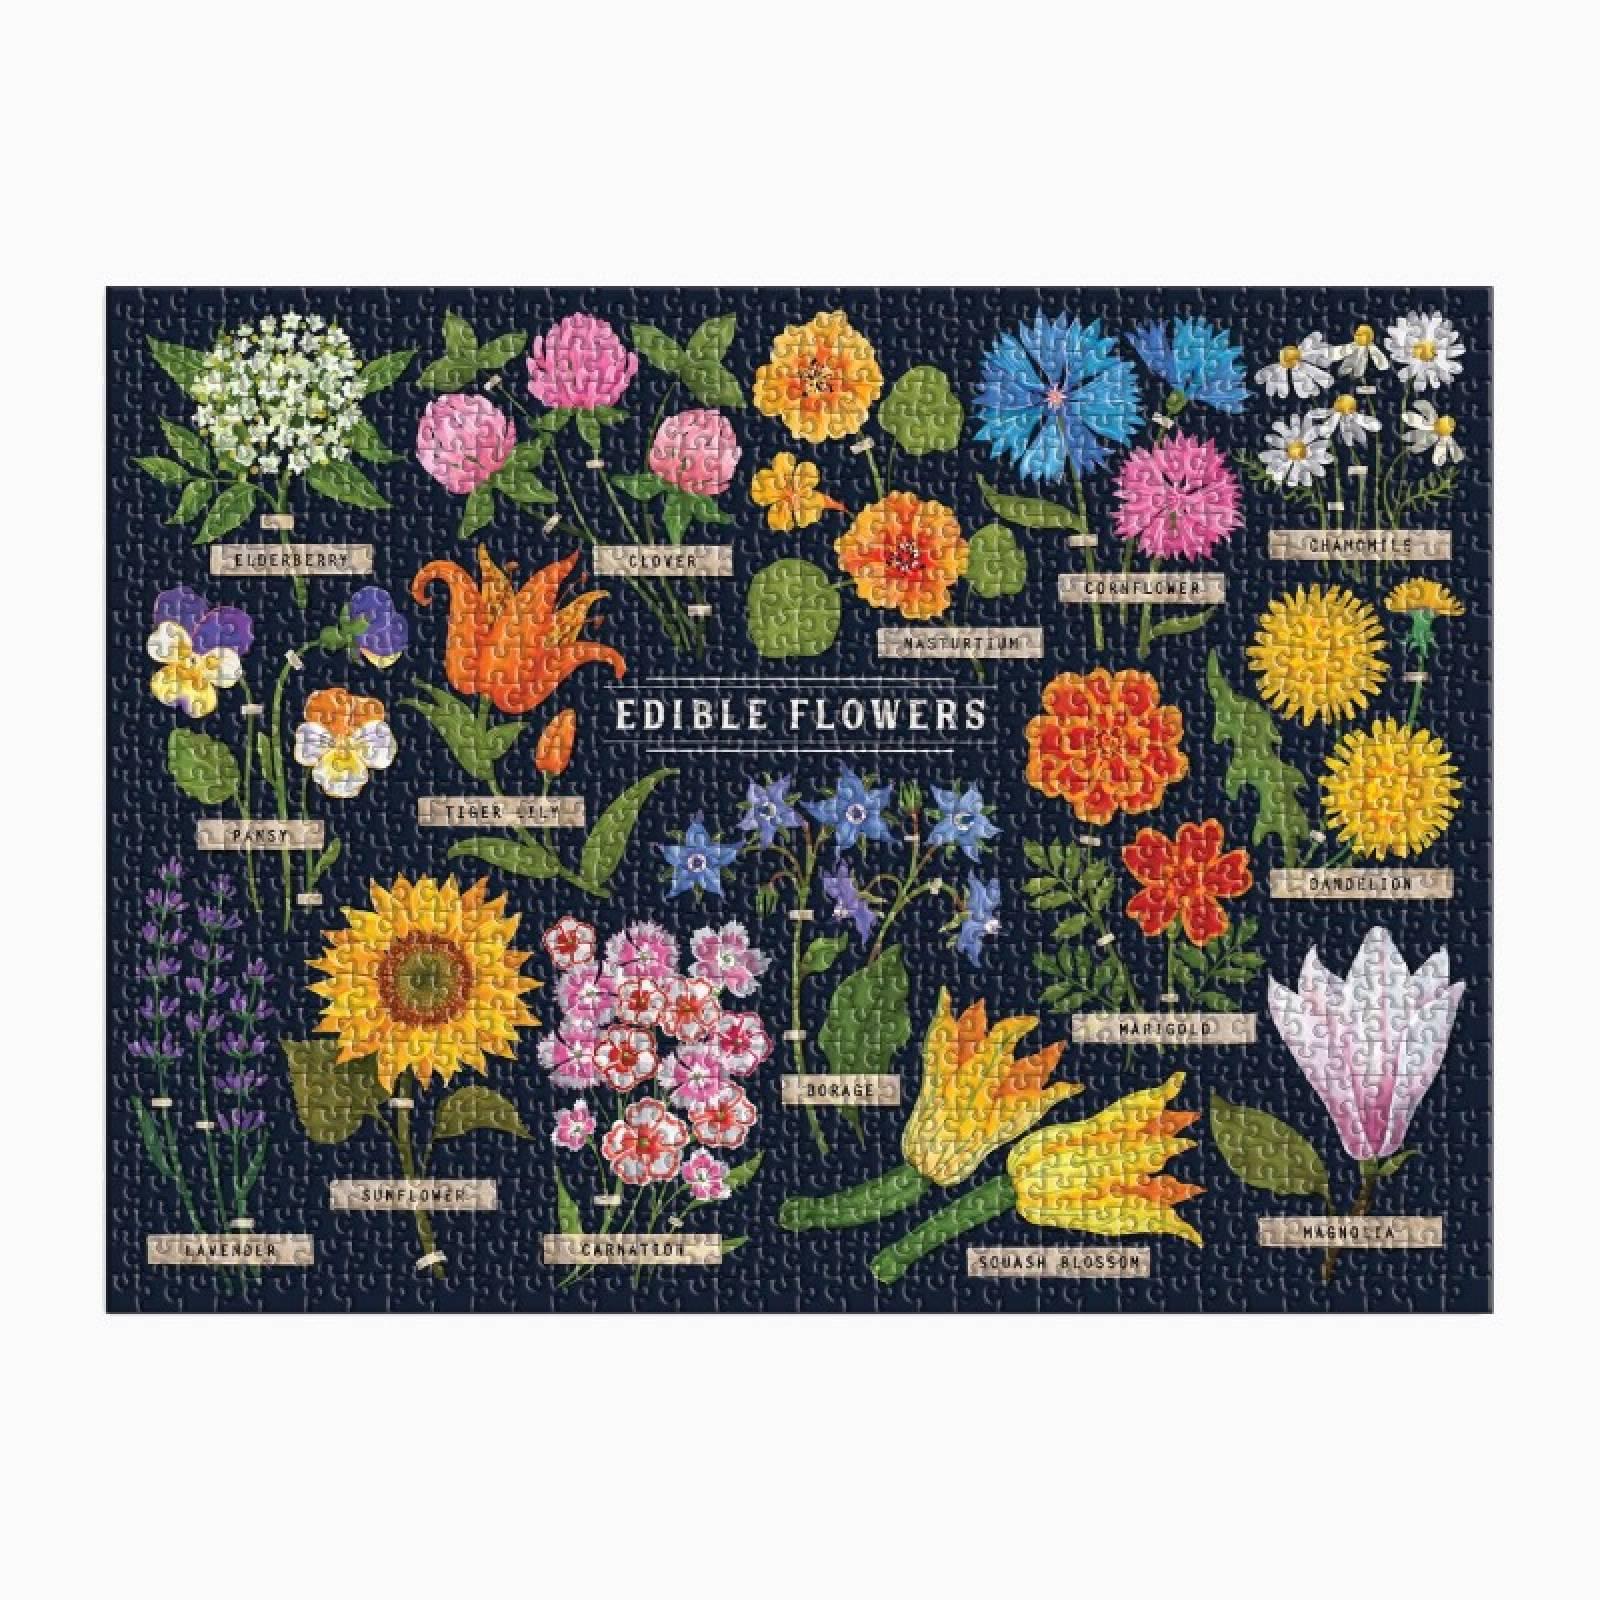 Edible Flowers - 1000 Piece Jigsaw Puzzle thumbnails